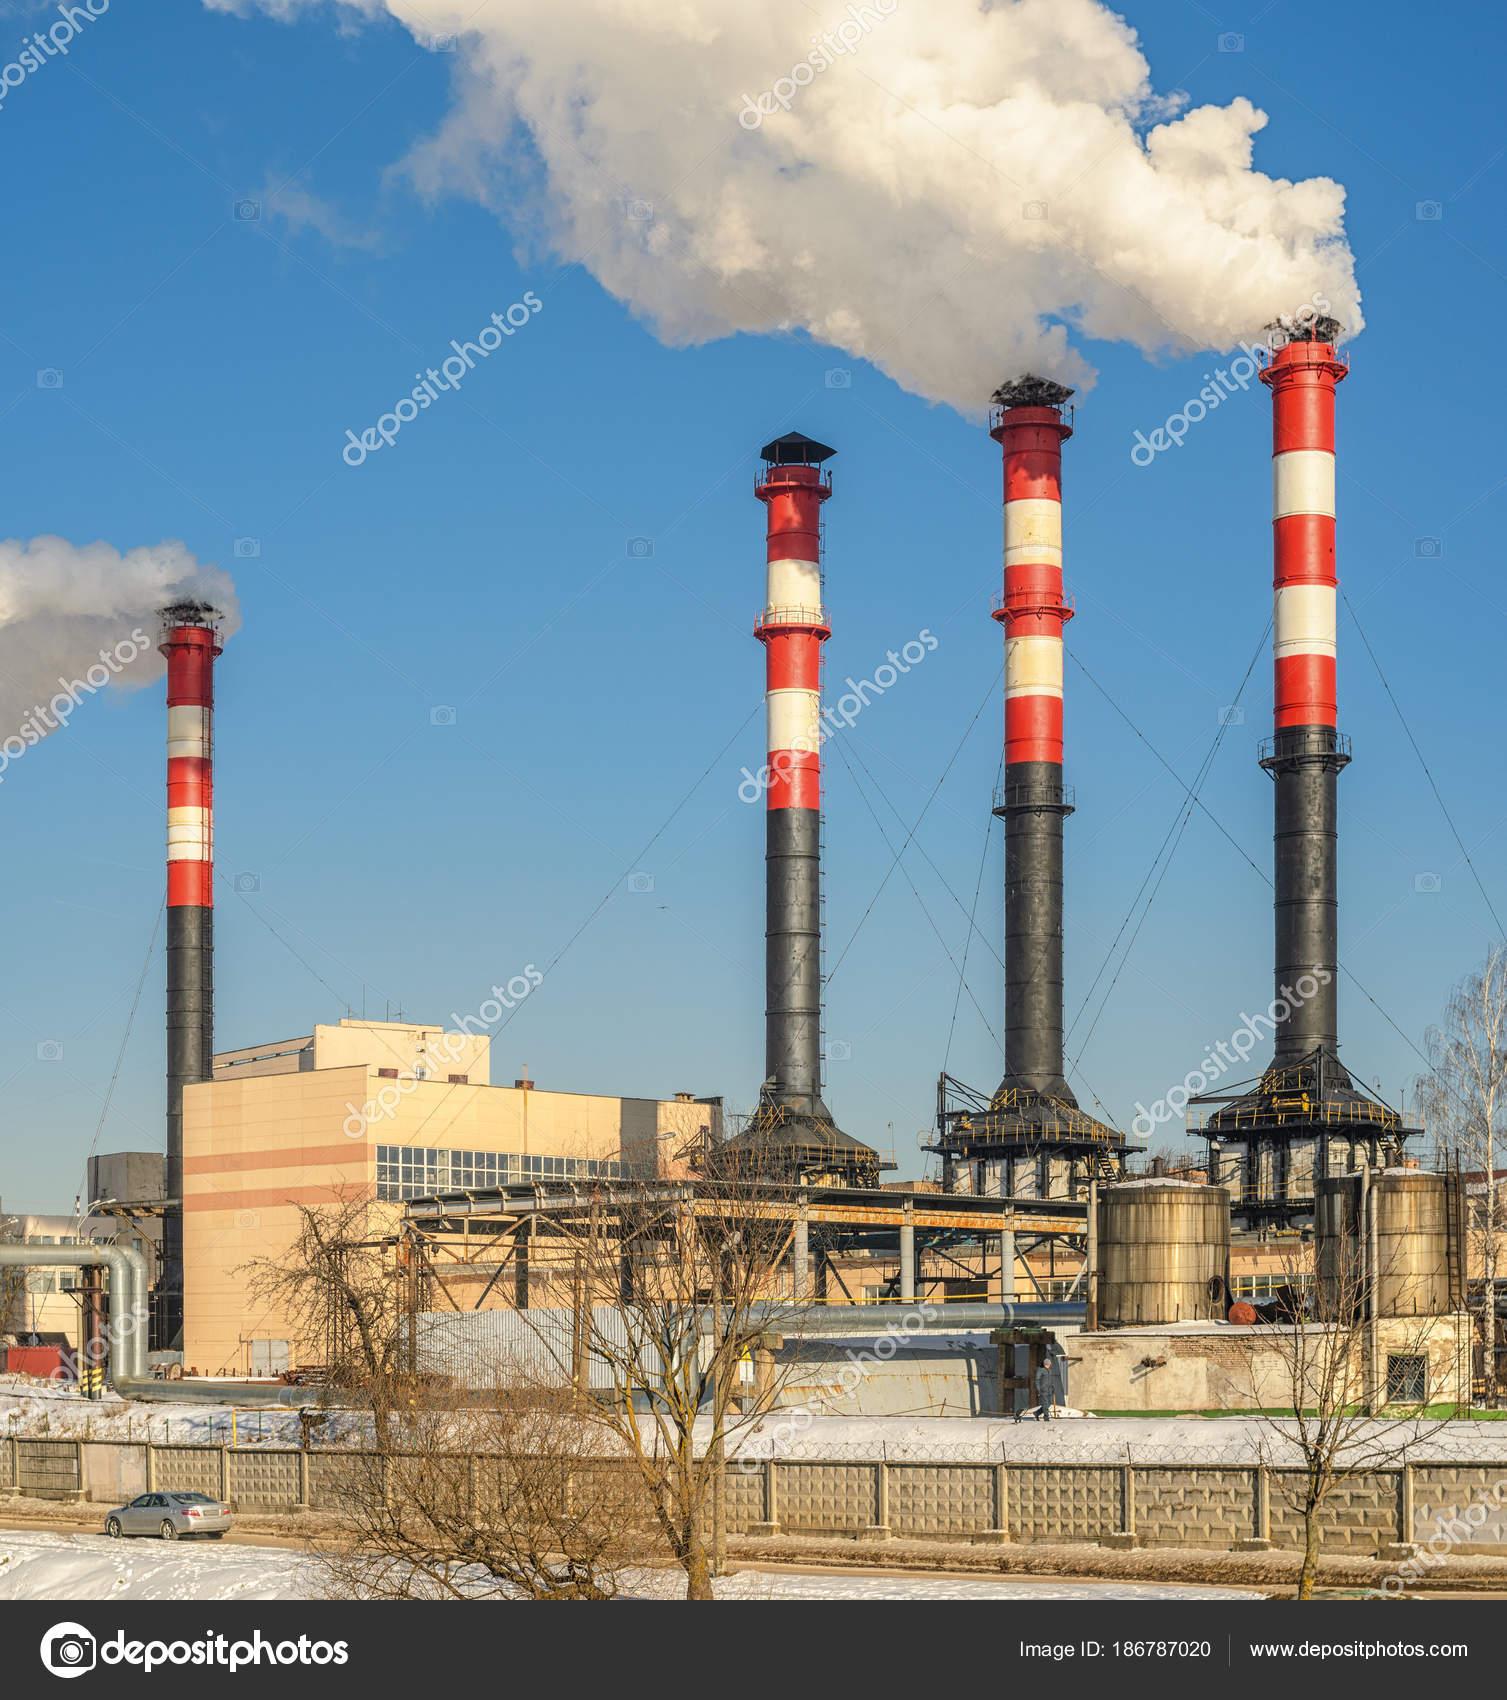 Thermal Power Plant Winter Operation High Chimneys Emit Large Amount ...